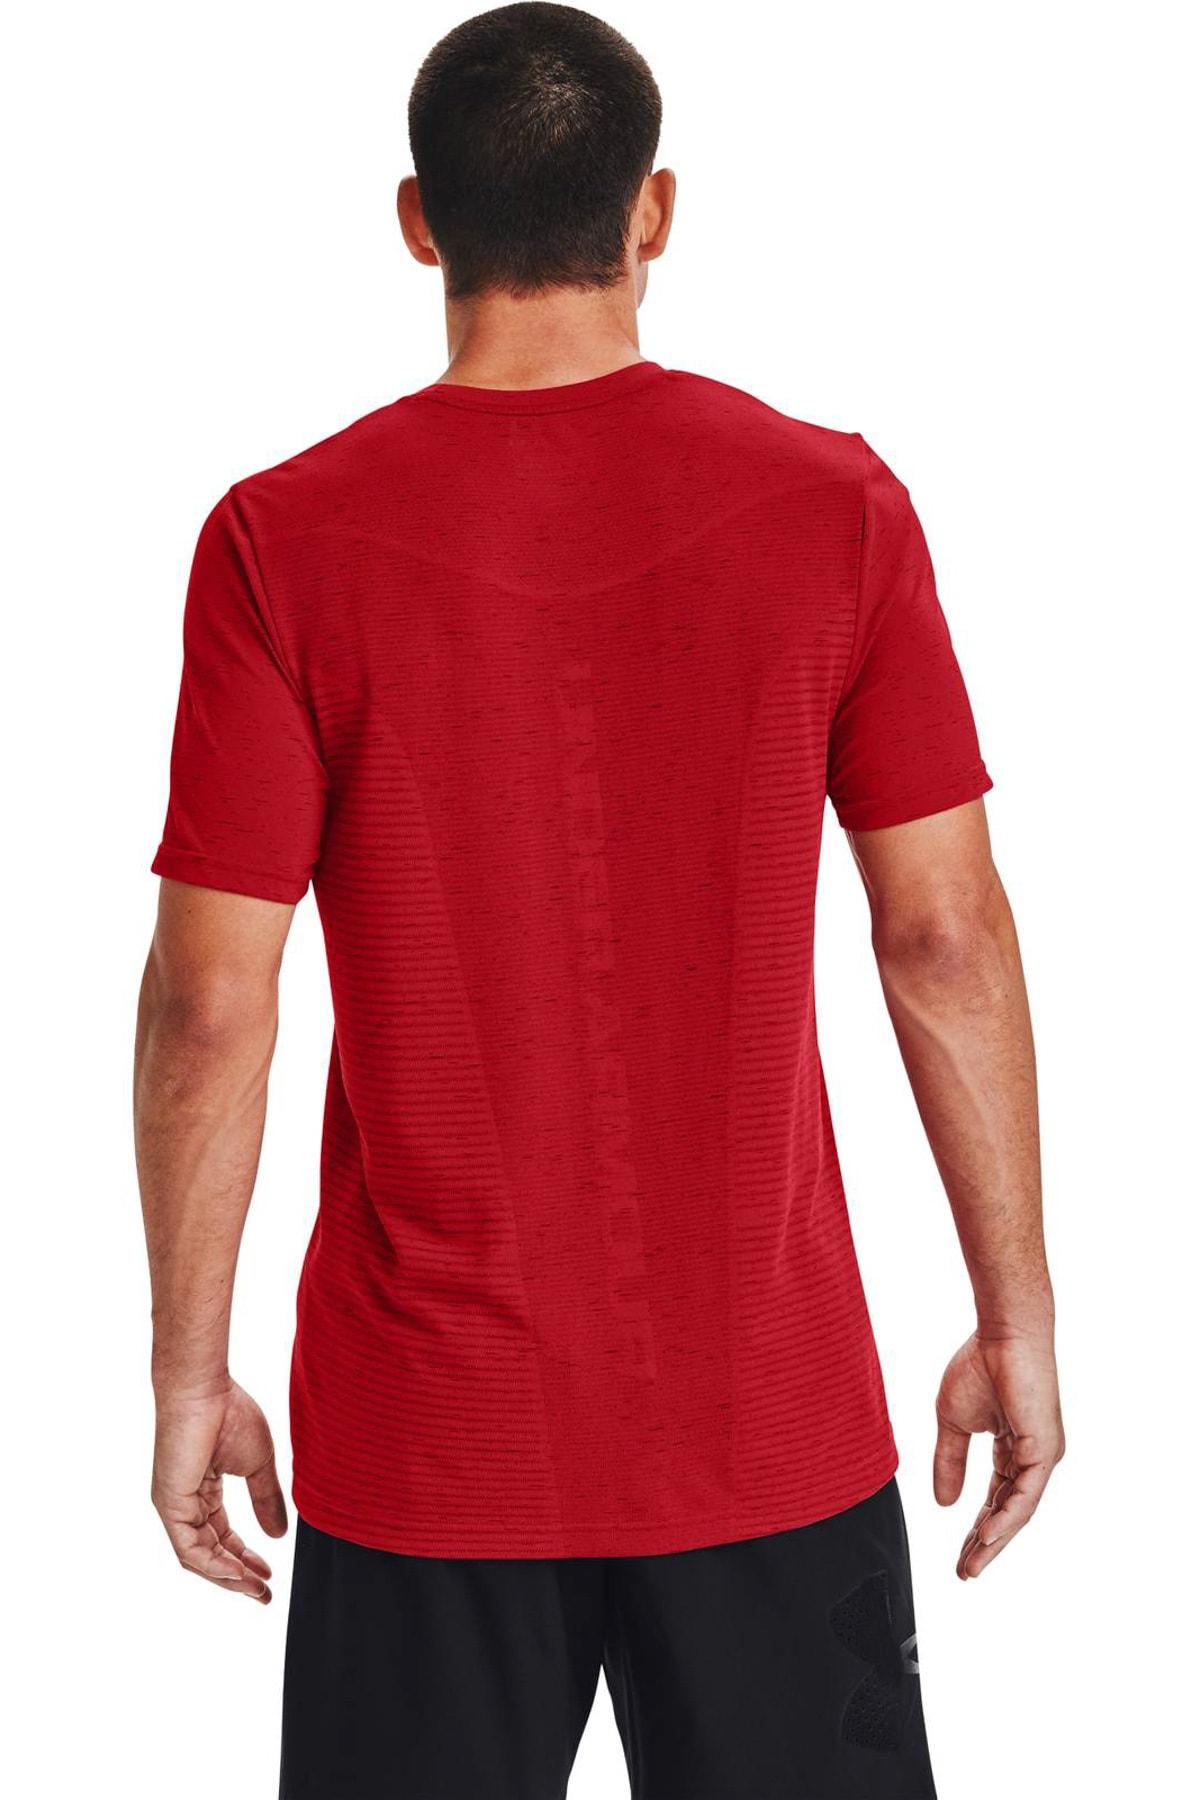 Under Armour Erkek Spor T-Shirt - Ua Seamless Logo Ss - 1356798-608 2